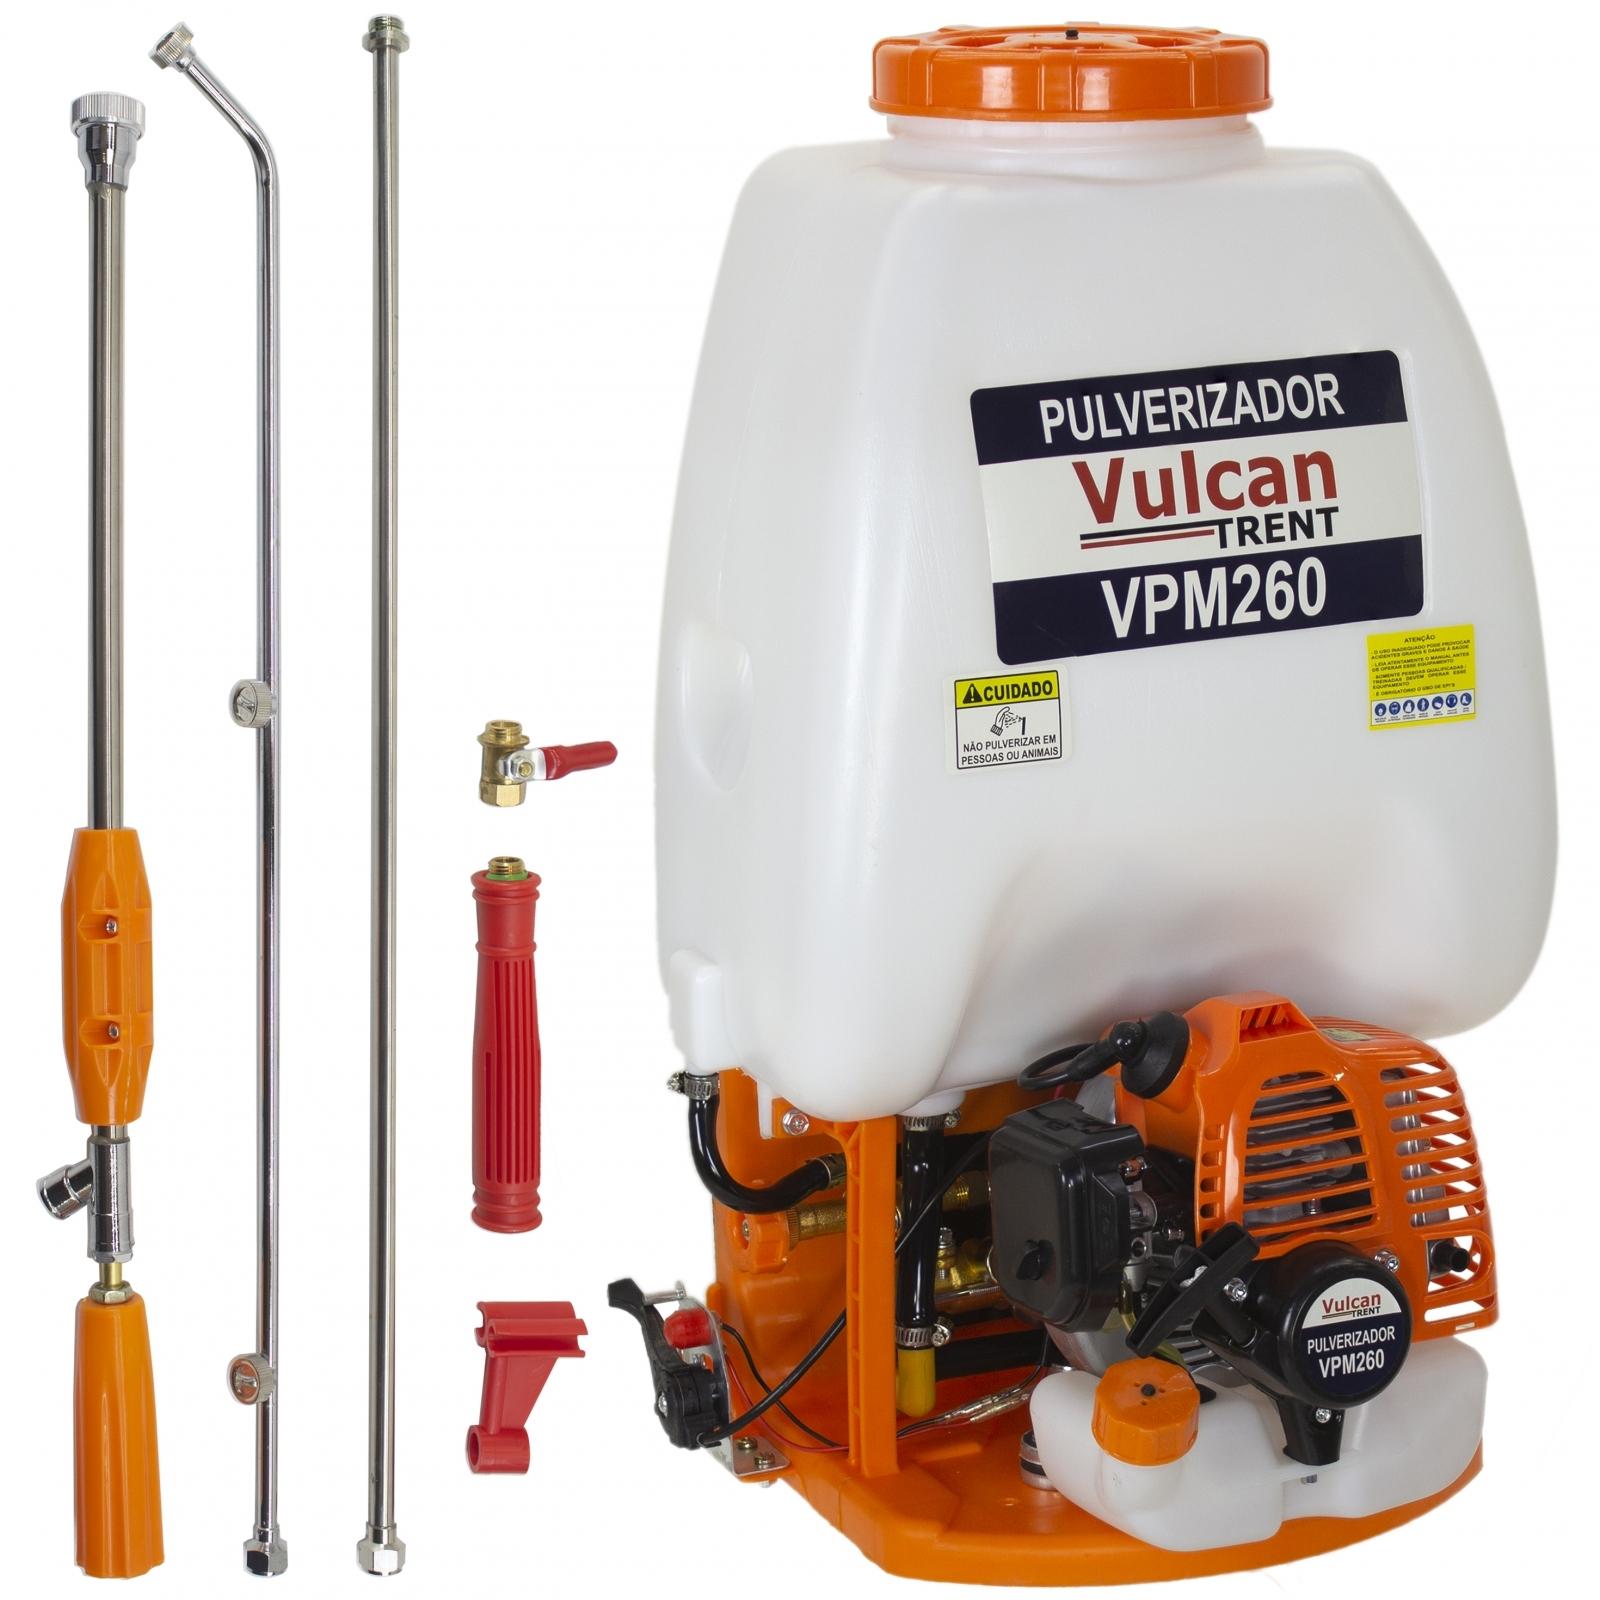 Pulverizador Costal Motor A Gasolina Vulcan Vpm260 Trent - Pc5 - Ferramentas MEP